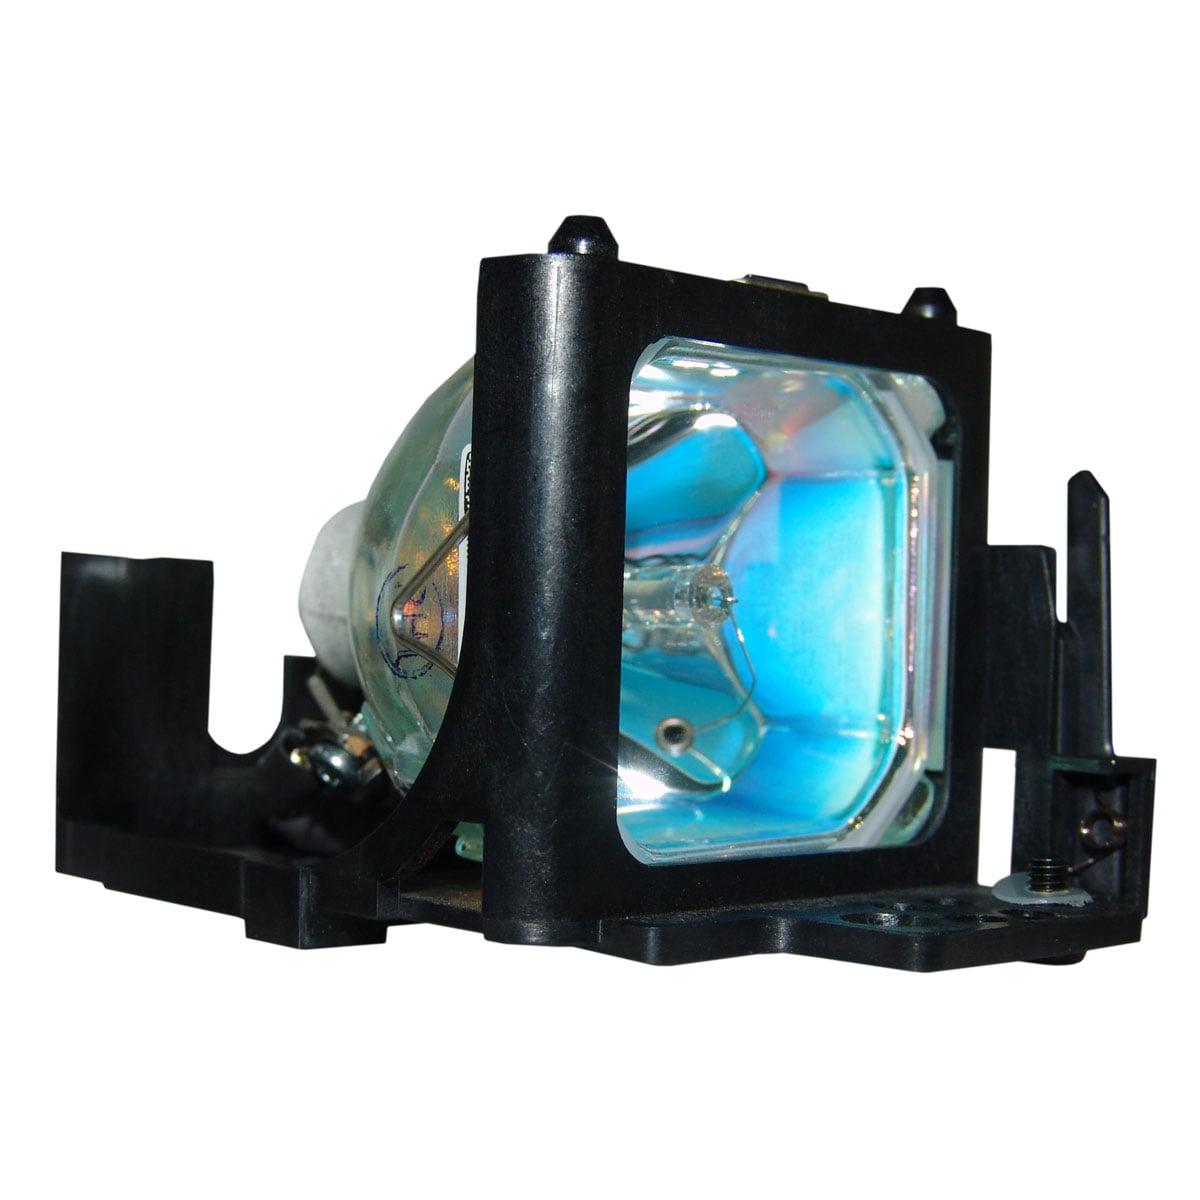 Lutema Platinum for Liesegang DV-345 Projector Lamp (Original Philips Bulb) - image 1 de 5